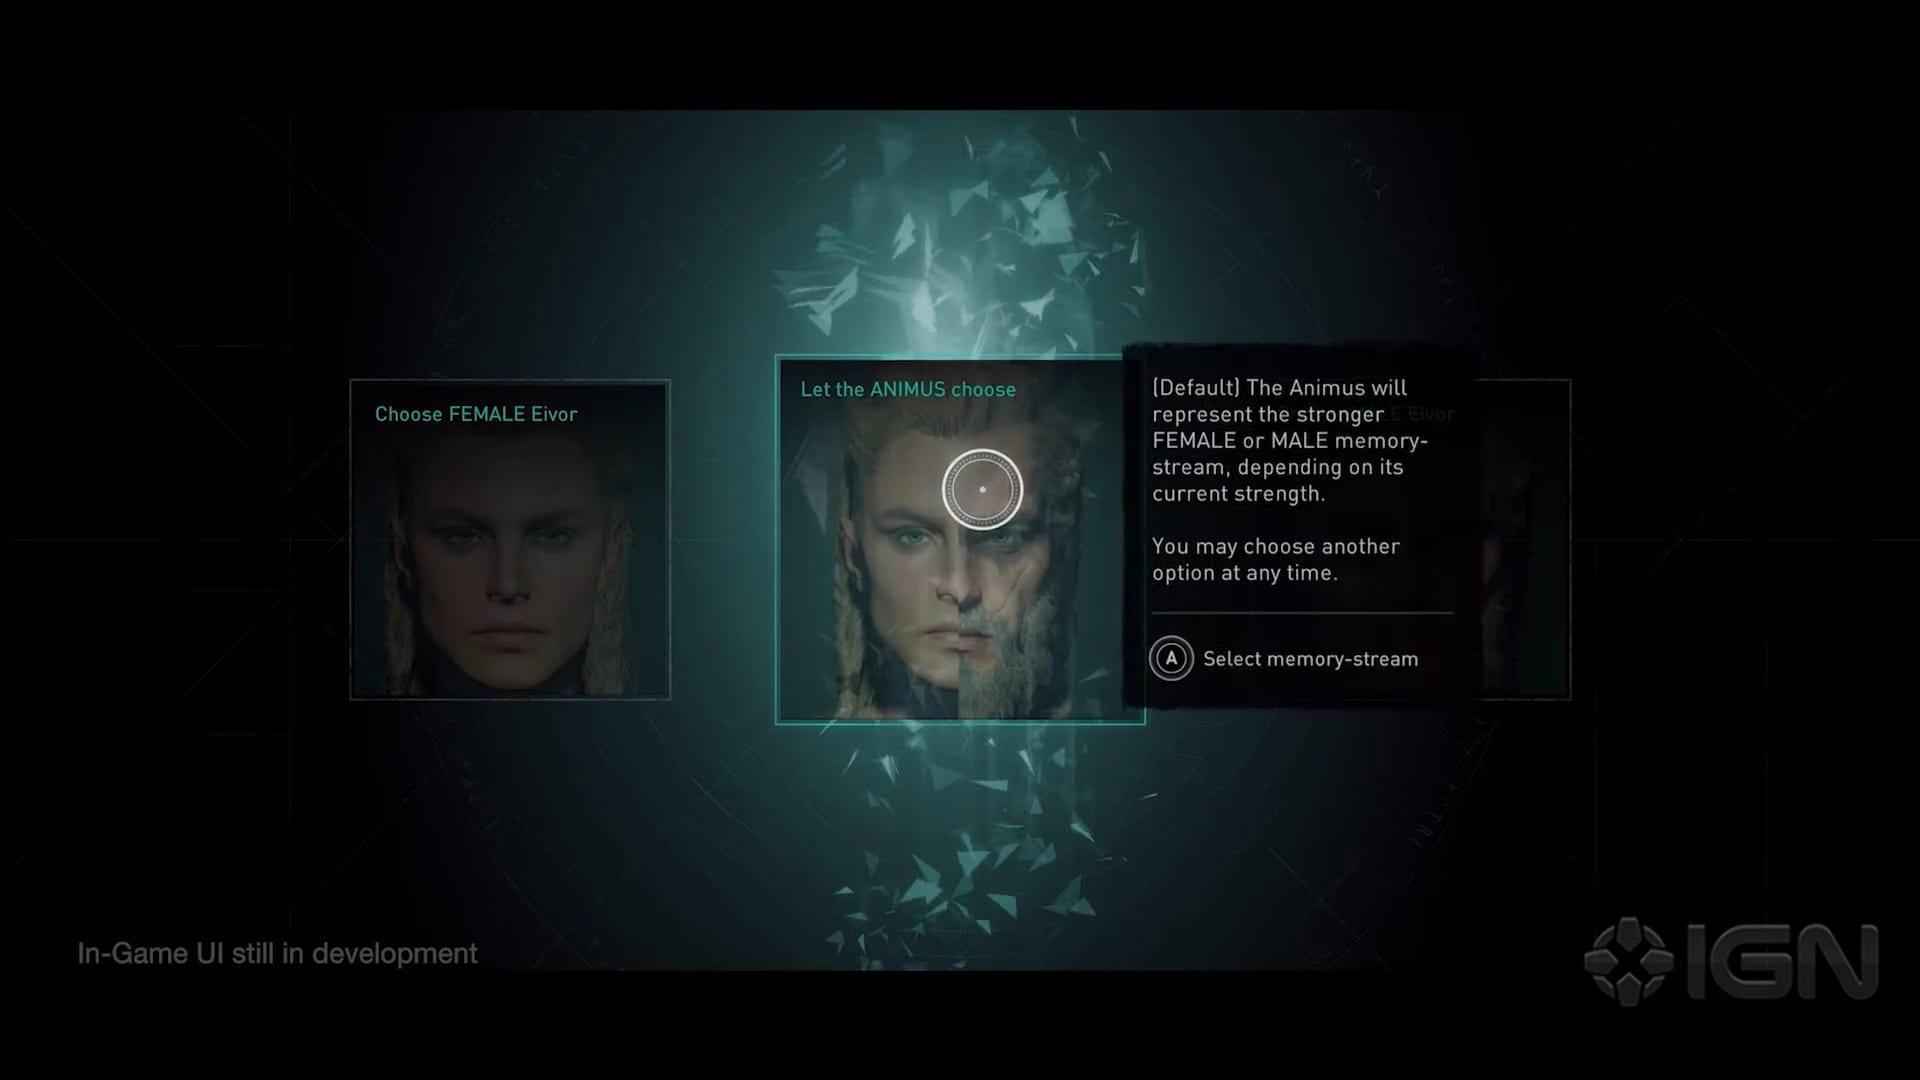 Assassin's Creed Valhalla Animus Eivor